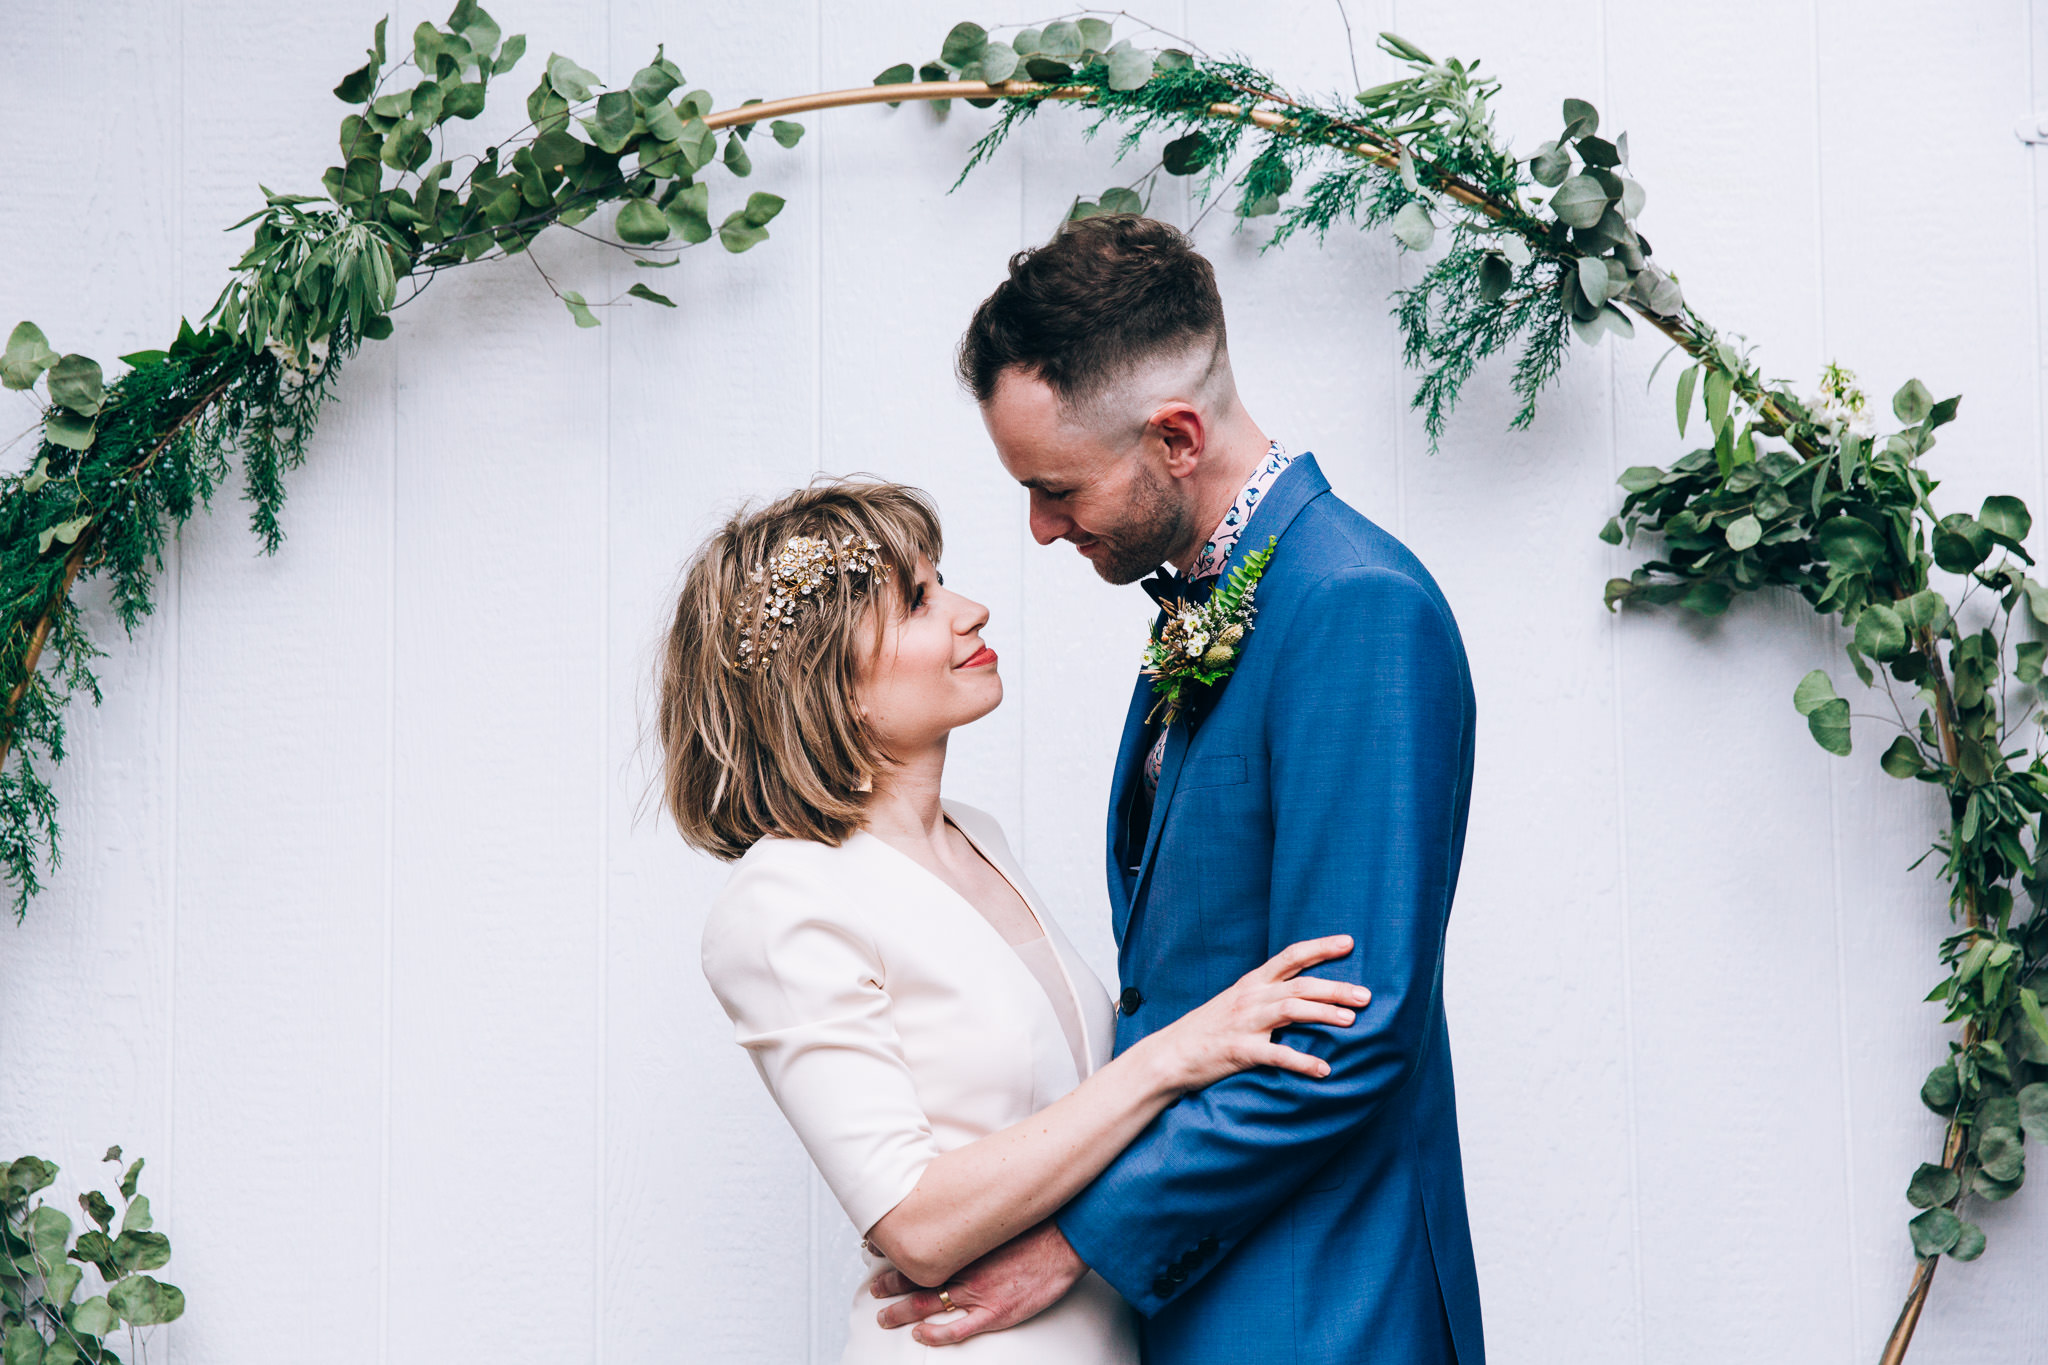 047_Canada-documentary-wedding-photograp